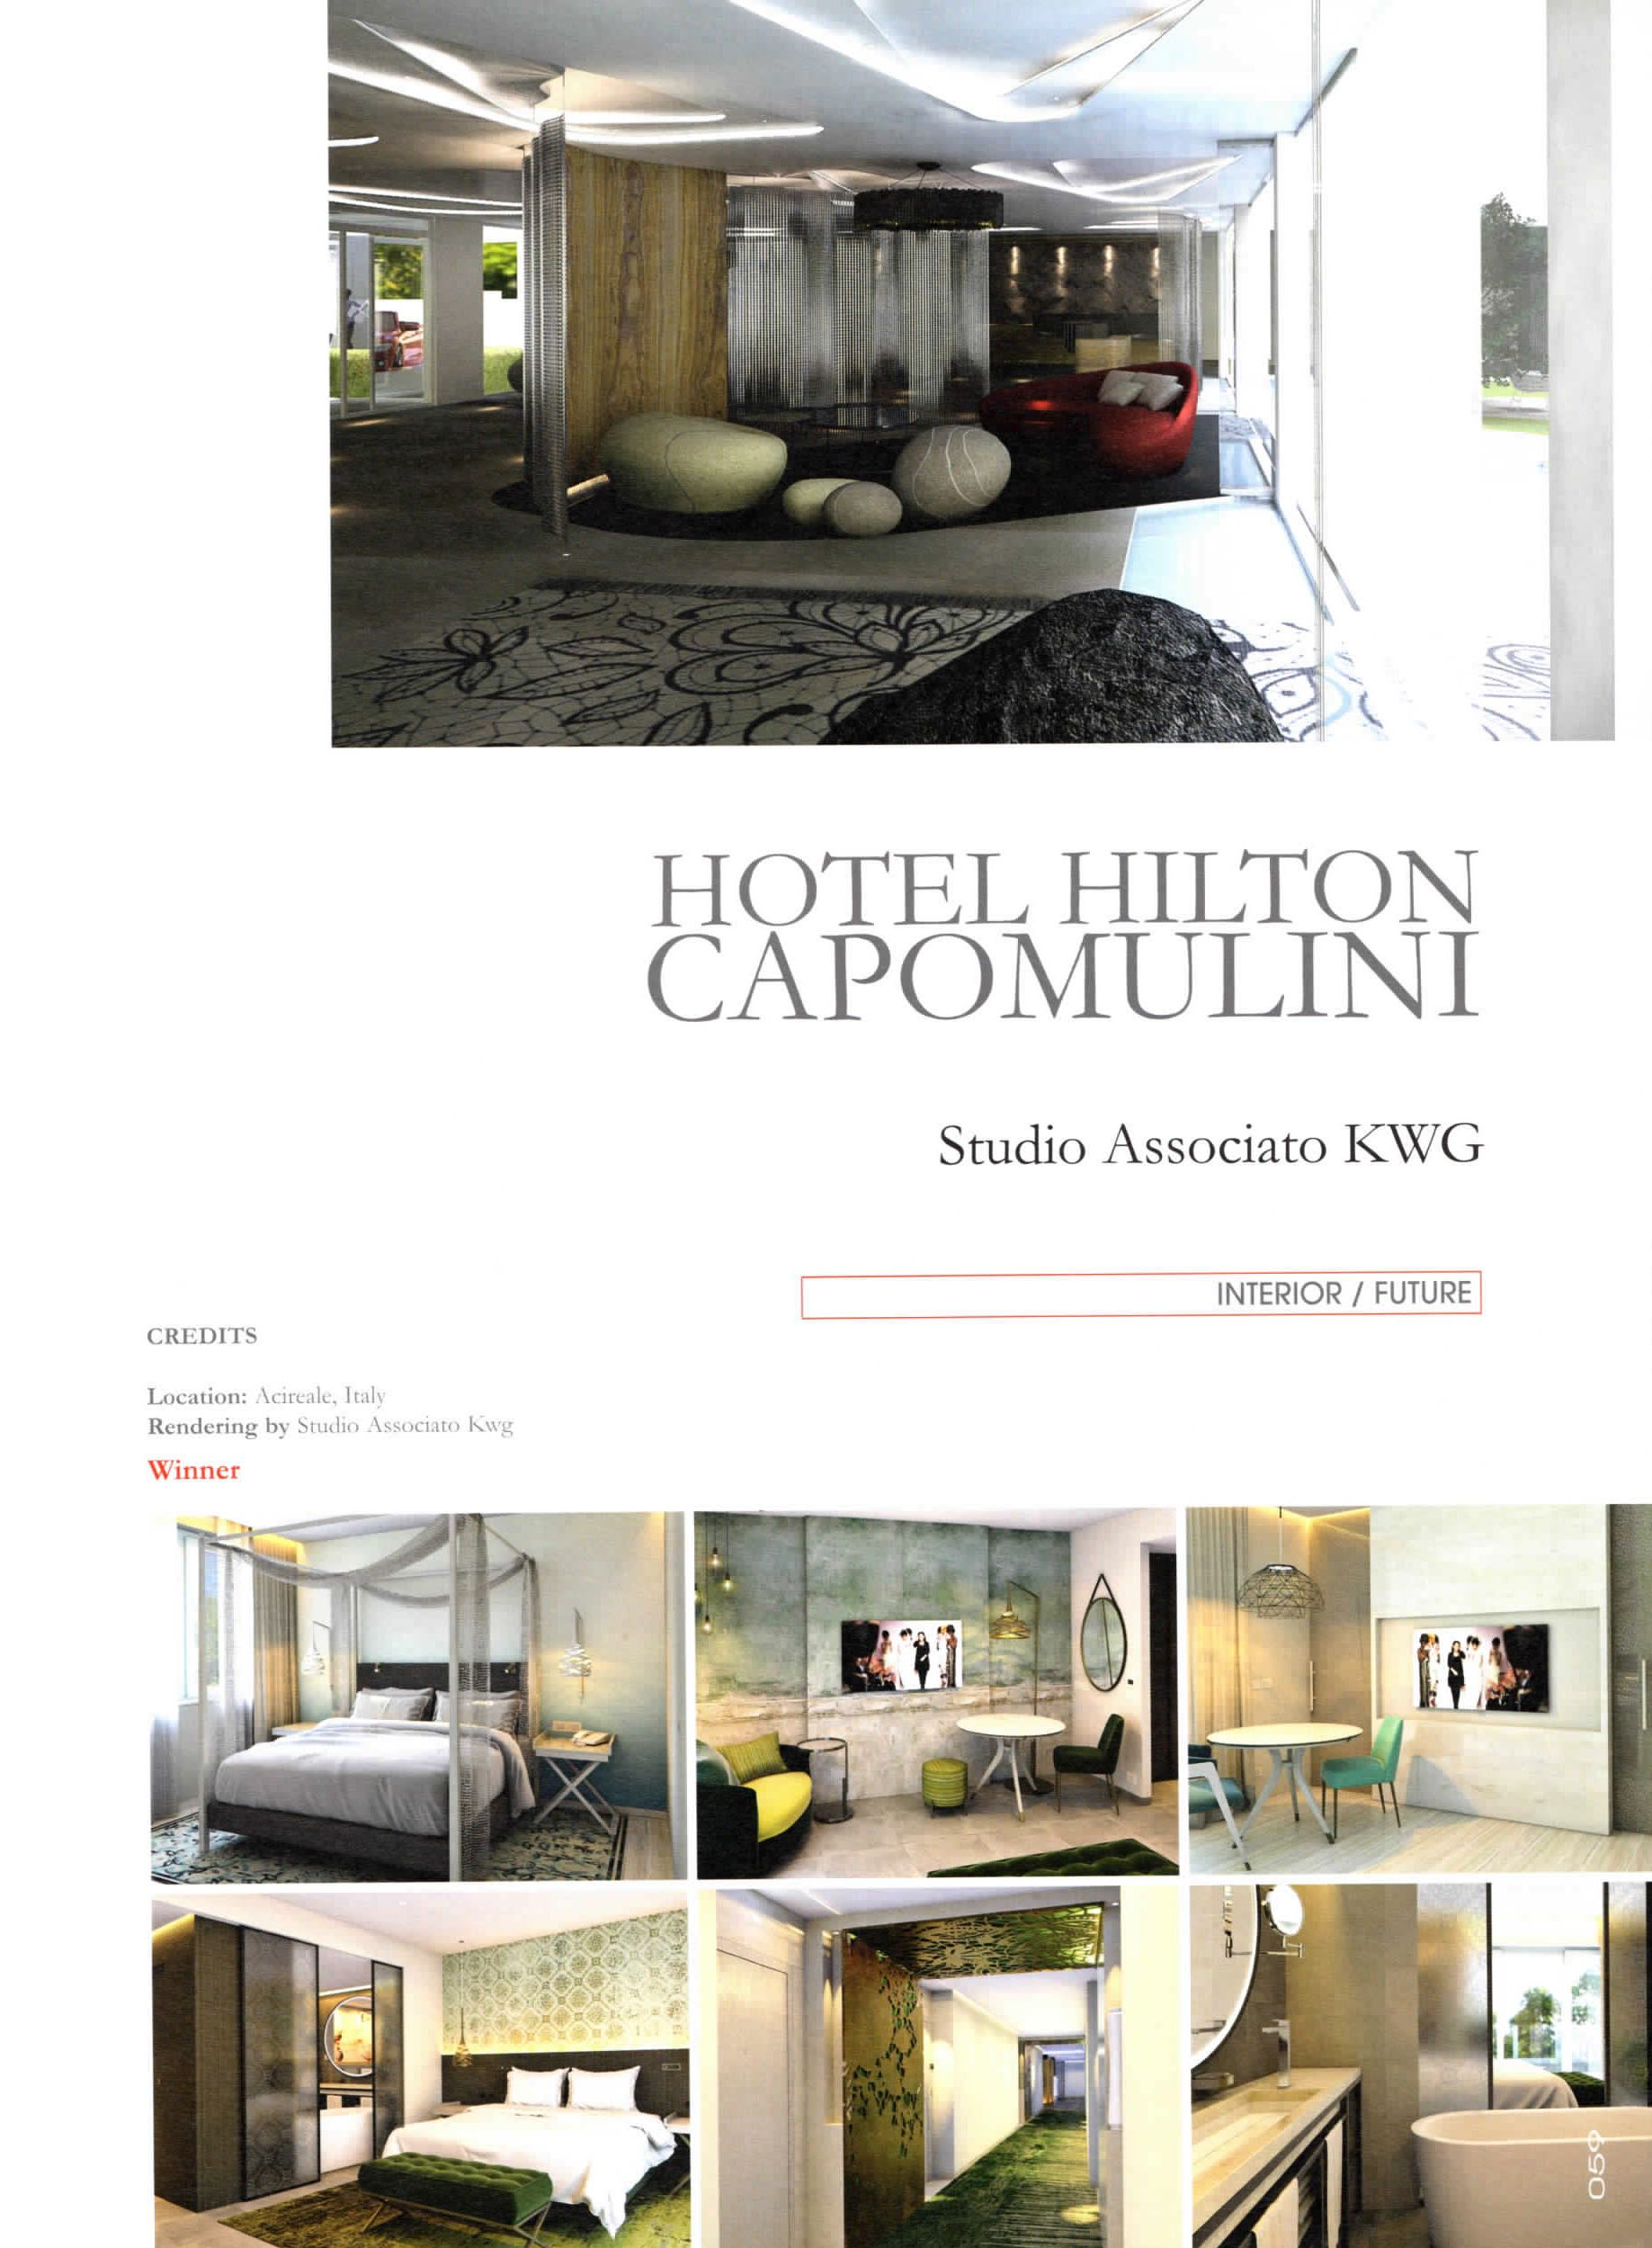 Hilton Catania Capomulini Lavoro press - kwg architects